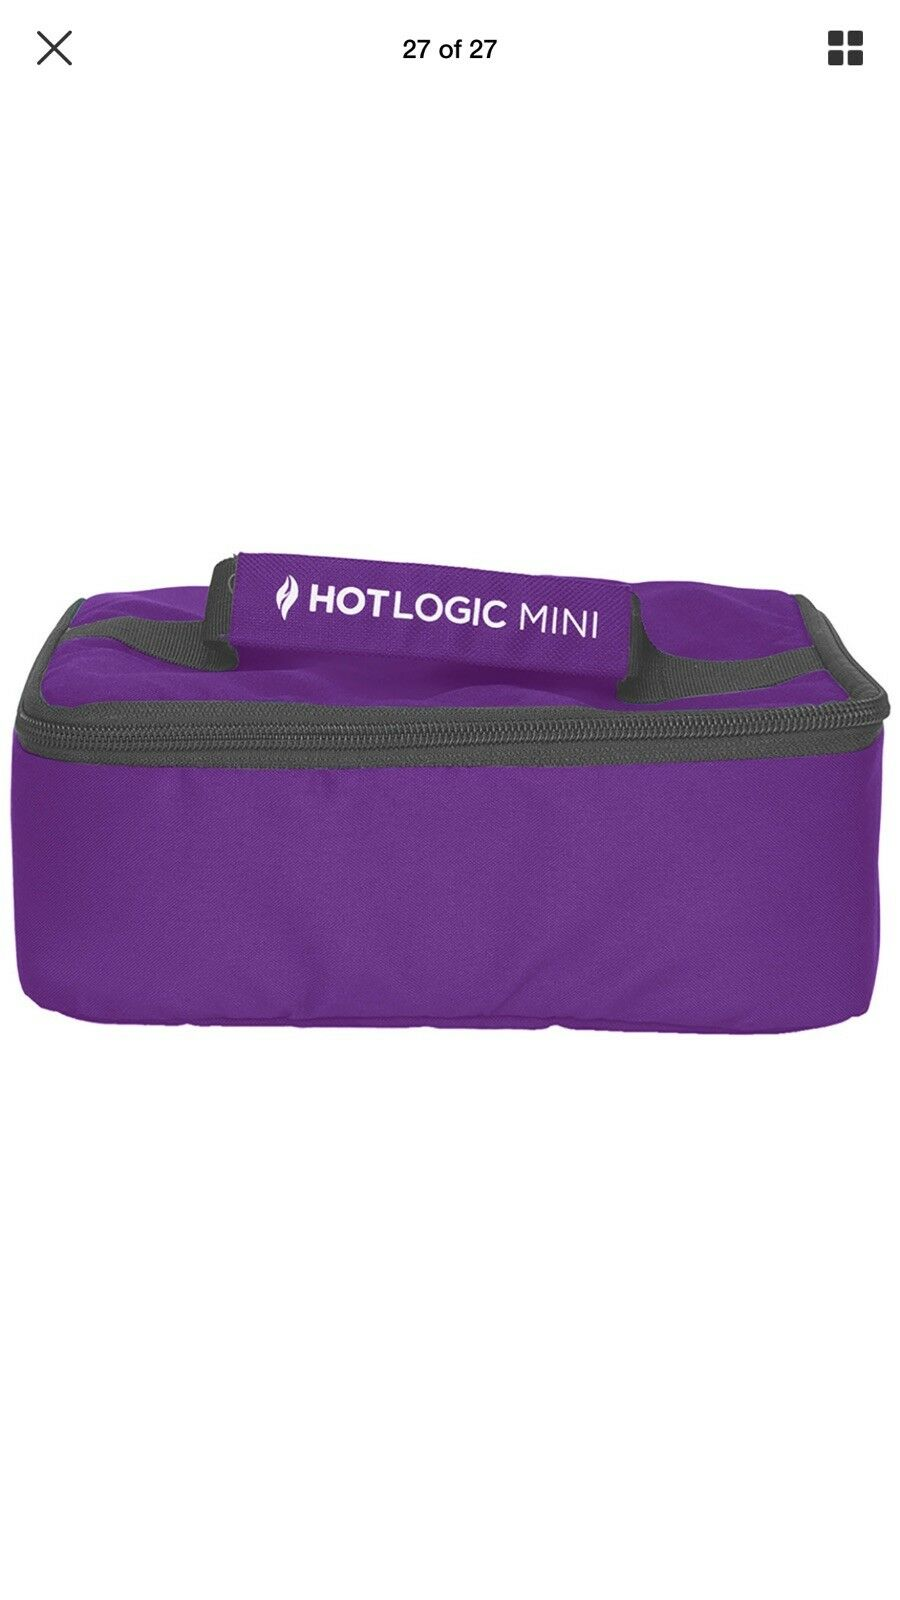 HotLogic Mini Personal Portable Oven, lila